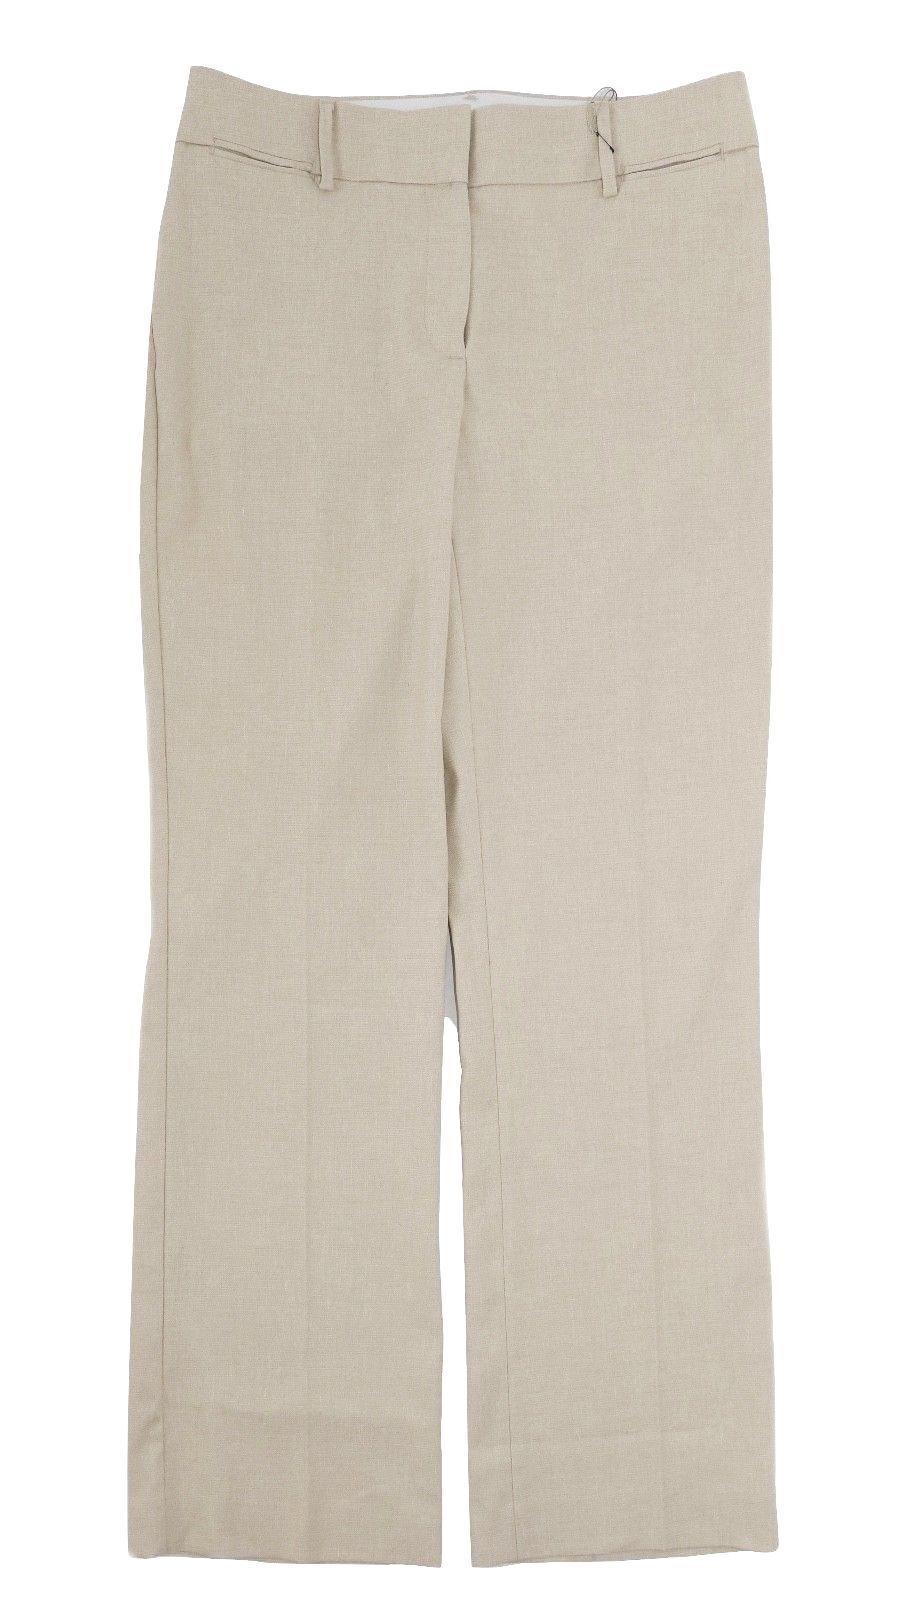 LOFT Women's 8 Marisa Fit - NWT 79  - Stone Textured Linen Blend Trouser Pants